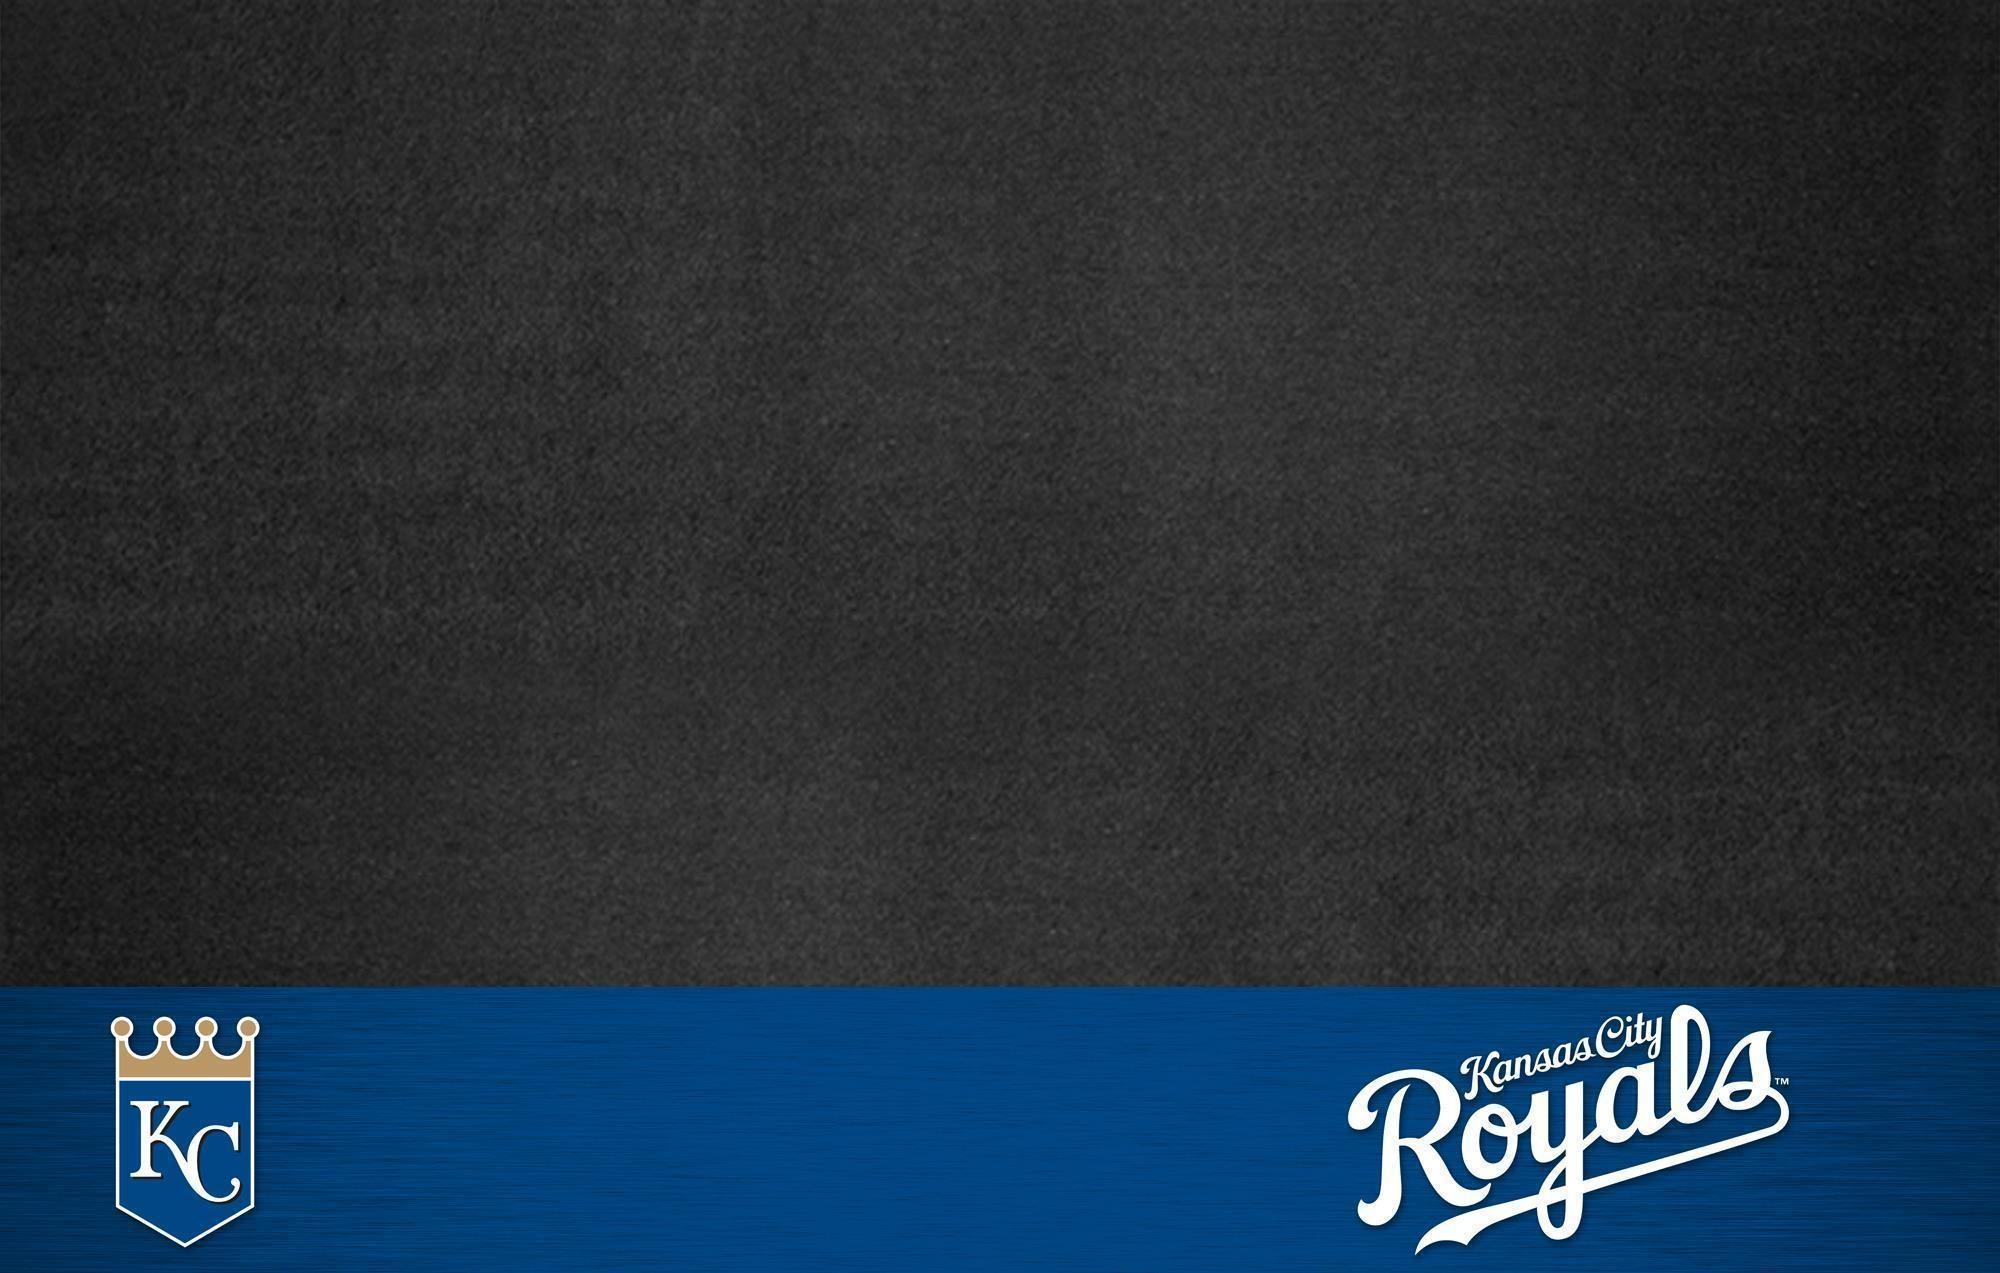 Kansas City Royals Wallpapers HD | PixelsTalk.Net